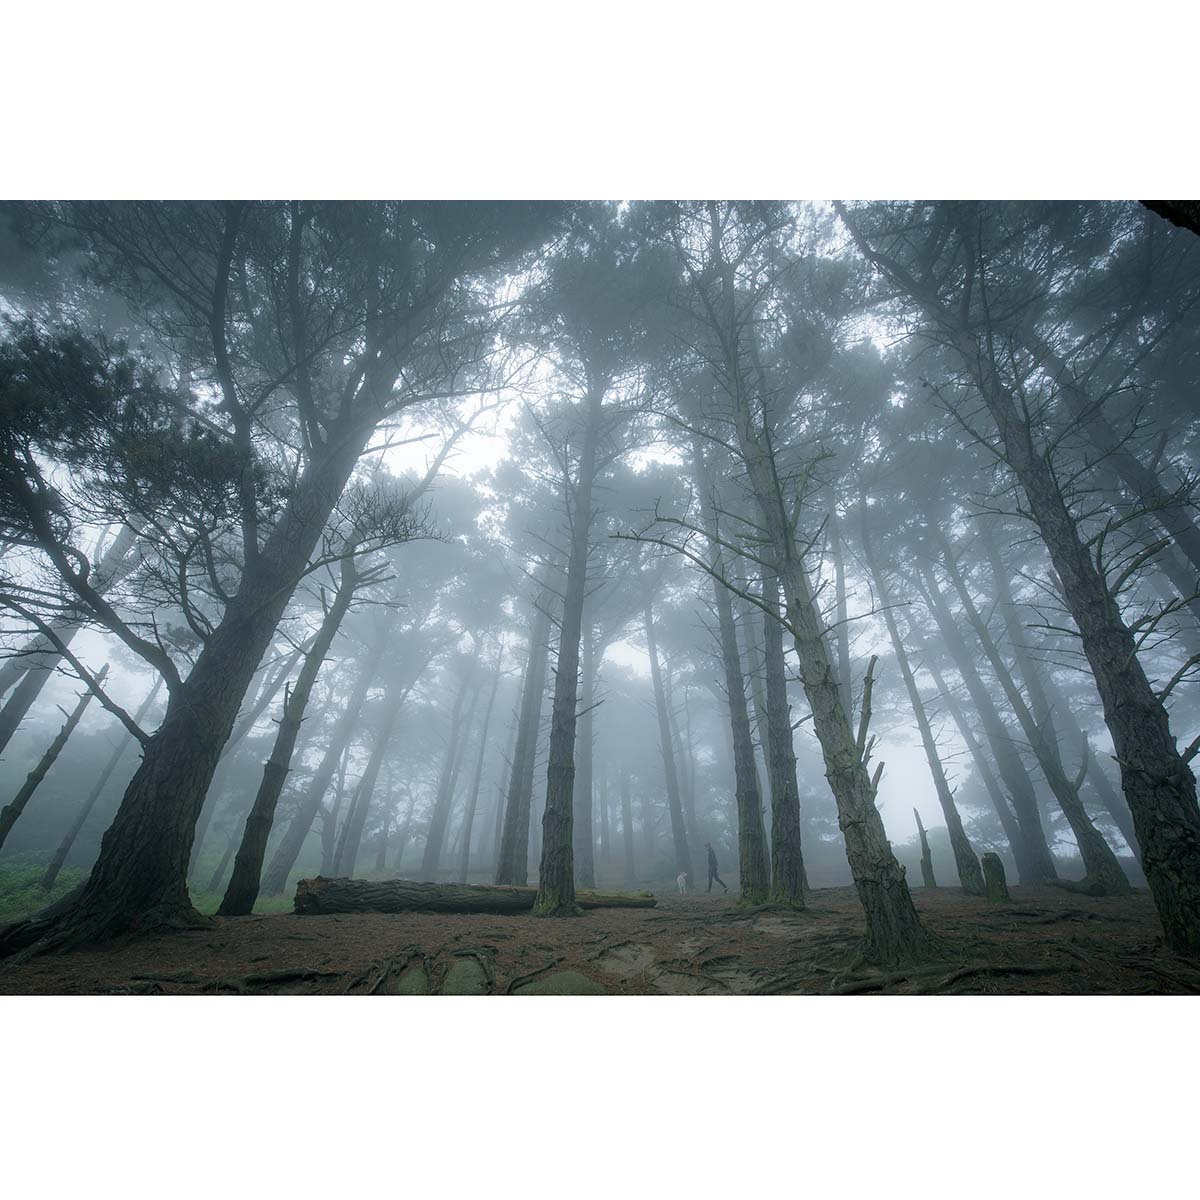 Dalkey Hill in the mist © Robert Kelly